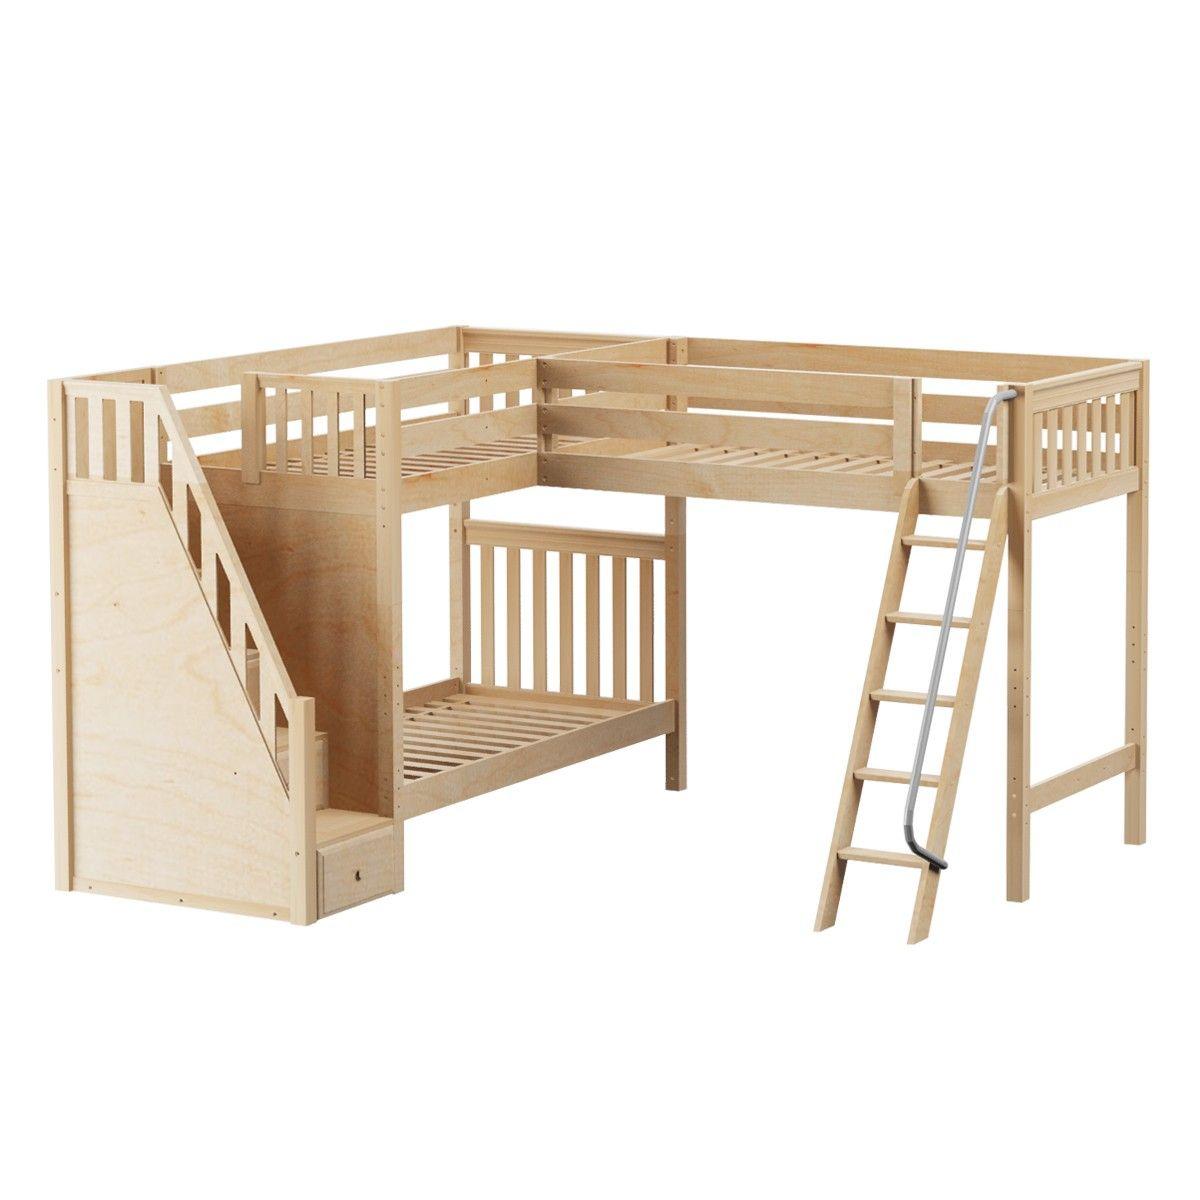 Maxtrixkids trey ns high corner loft bunk with ladder and